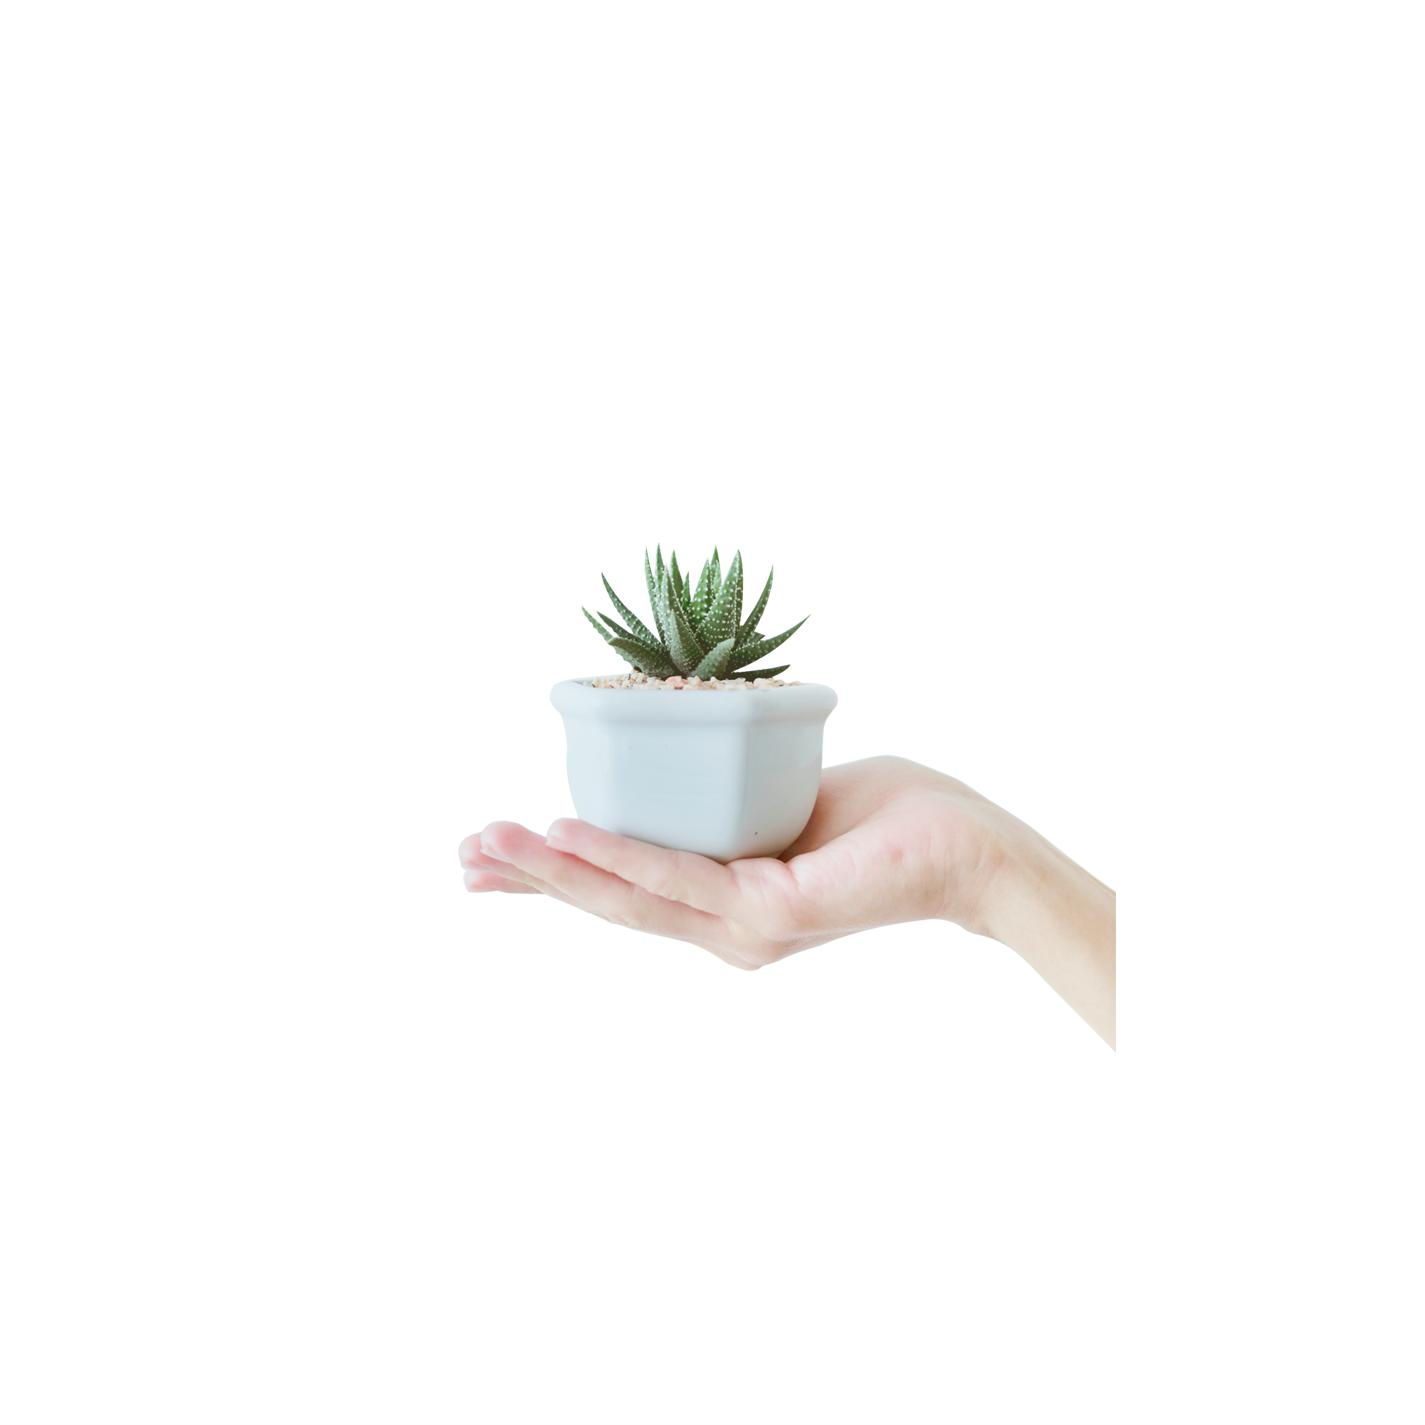 growth-image-1